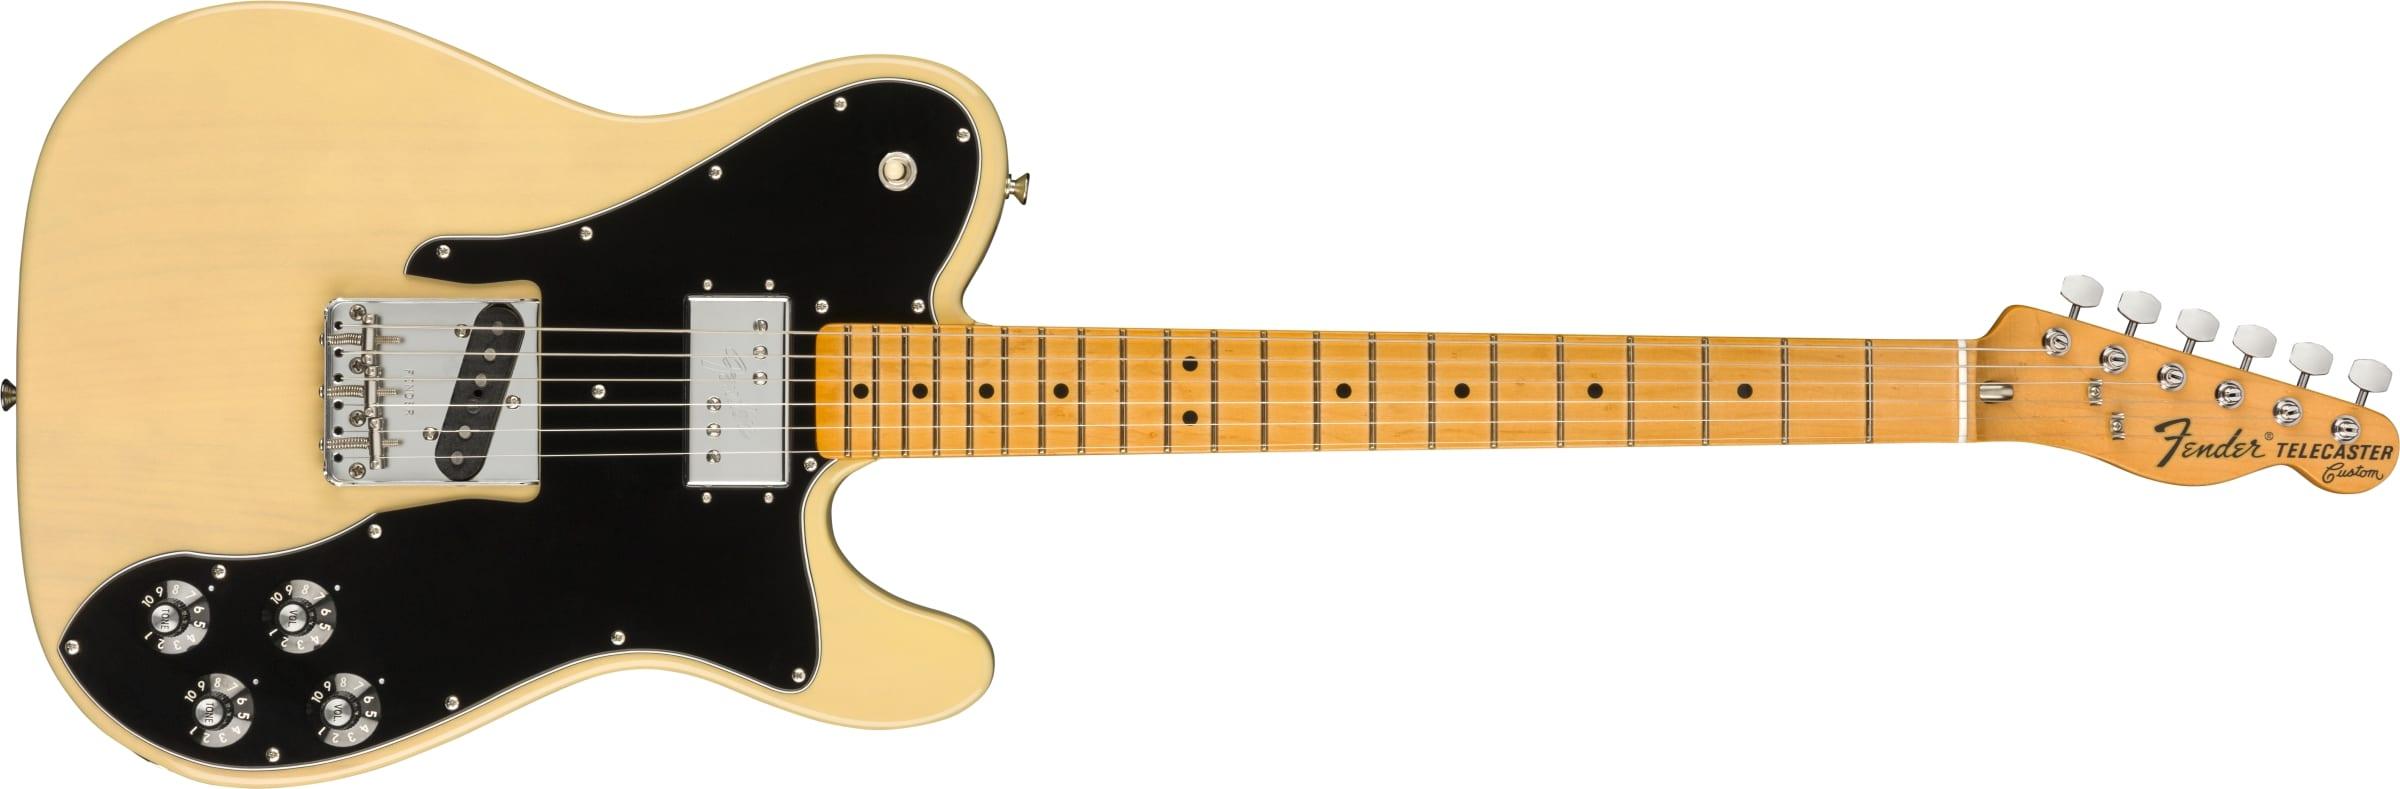 Fender American Originals 70s Telecaster Custom Vintage Blonde